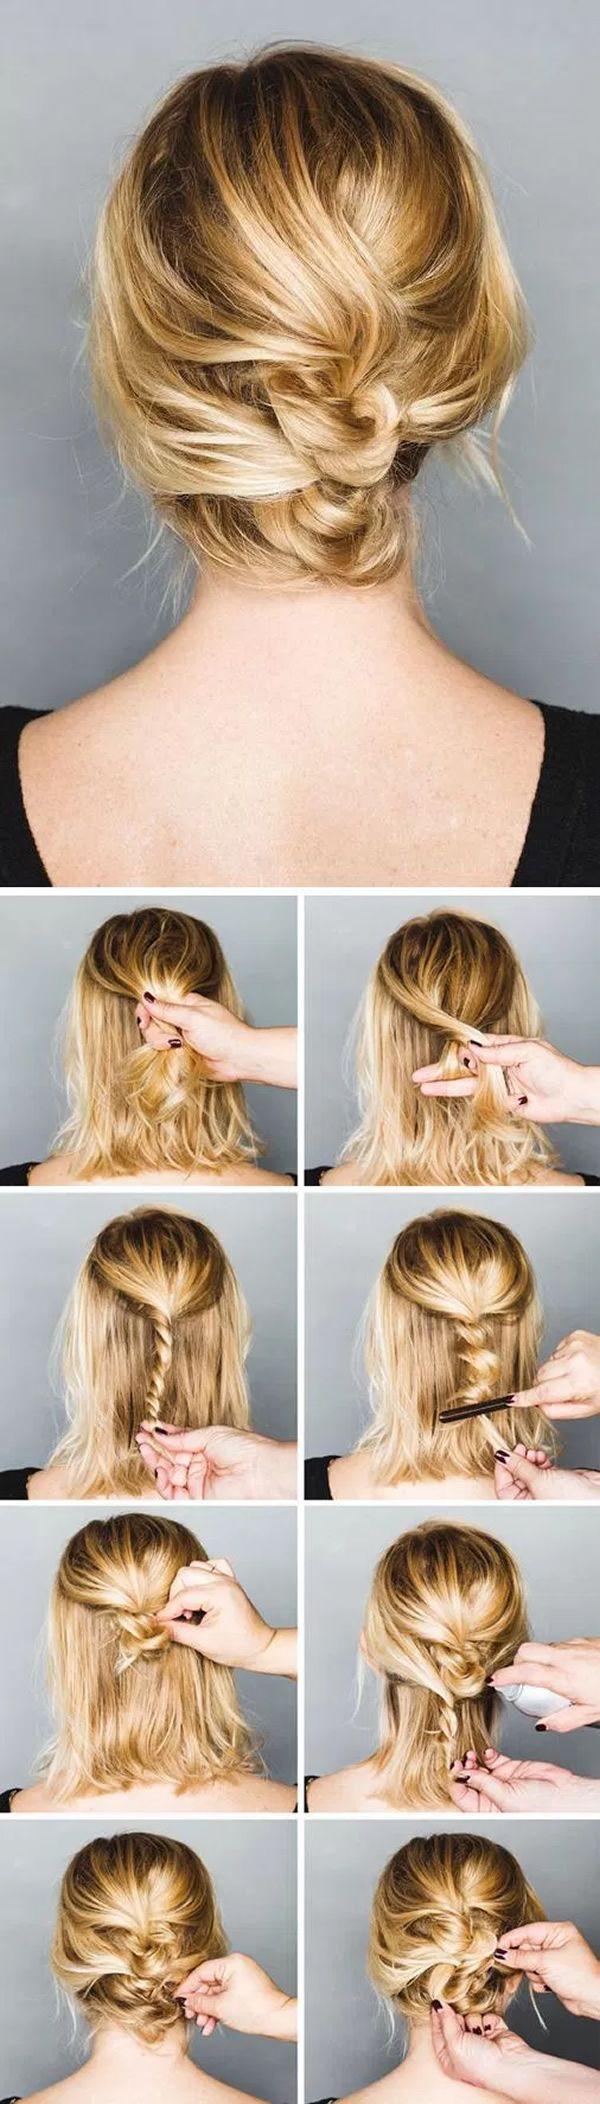 Peinados pelo corto semi recogido nuca hair u makeup pinterest